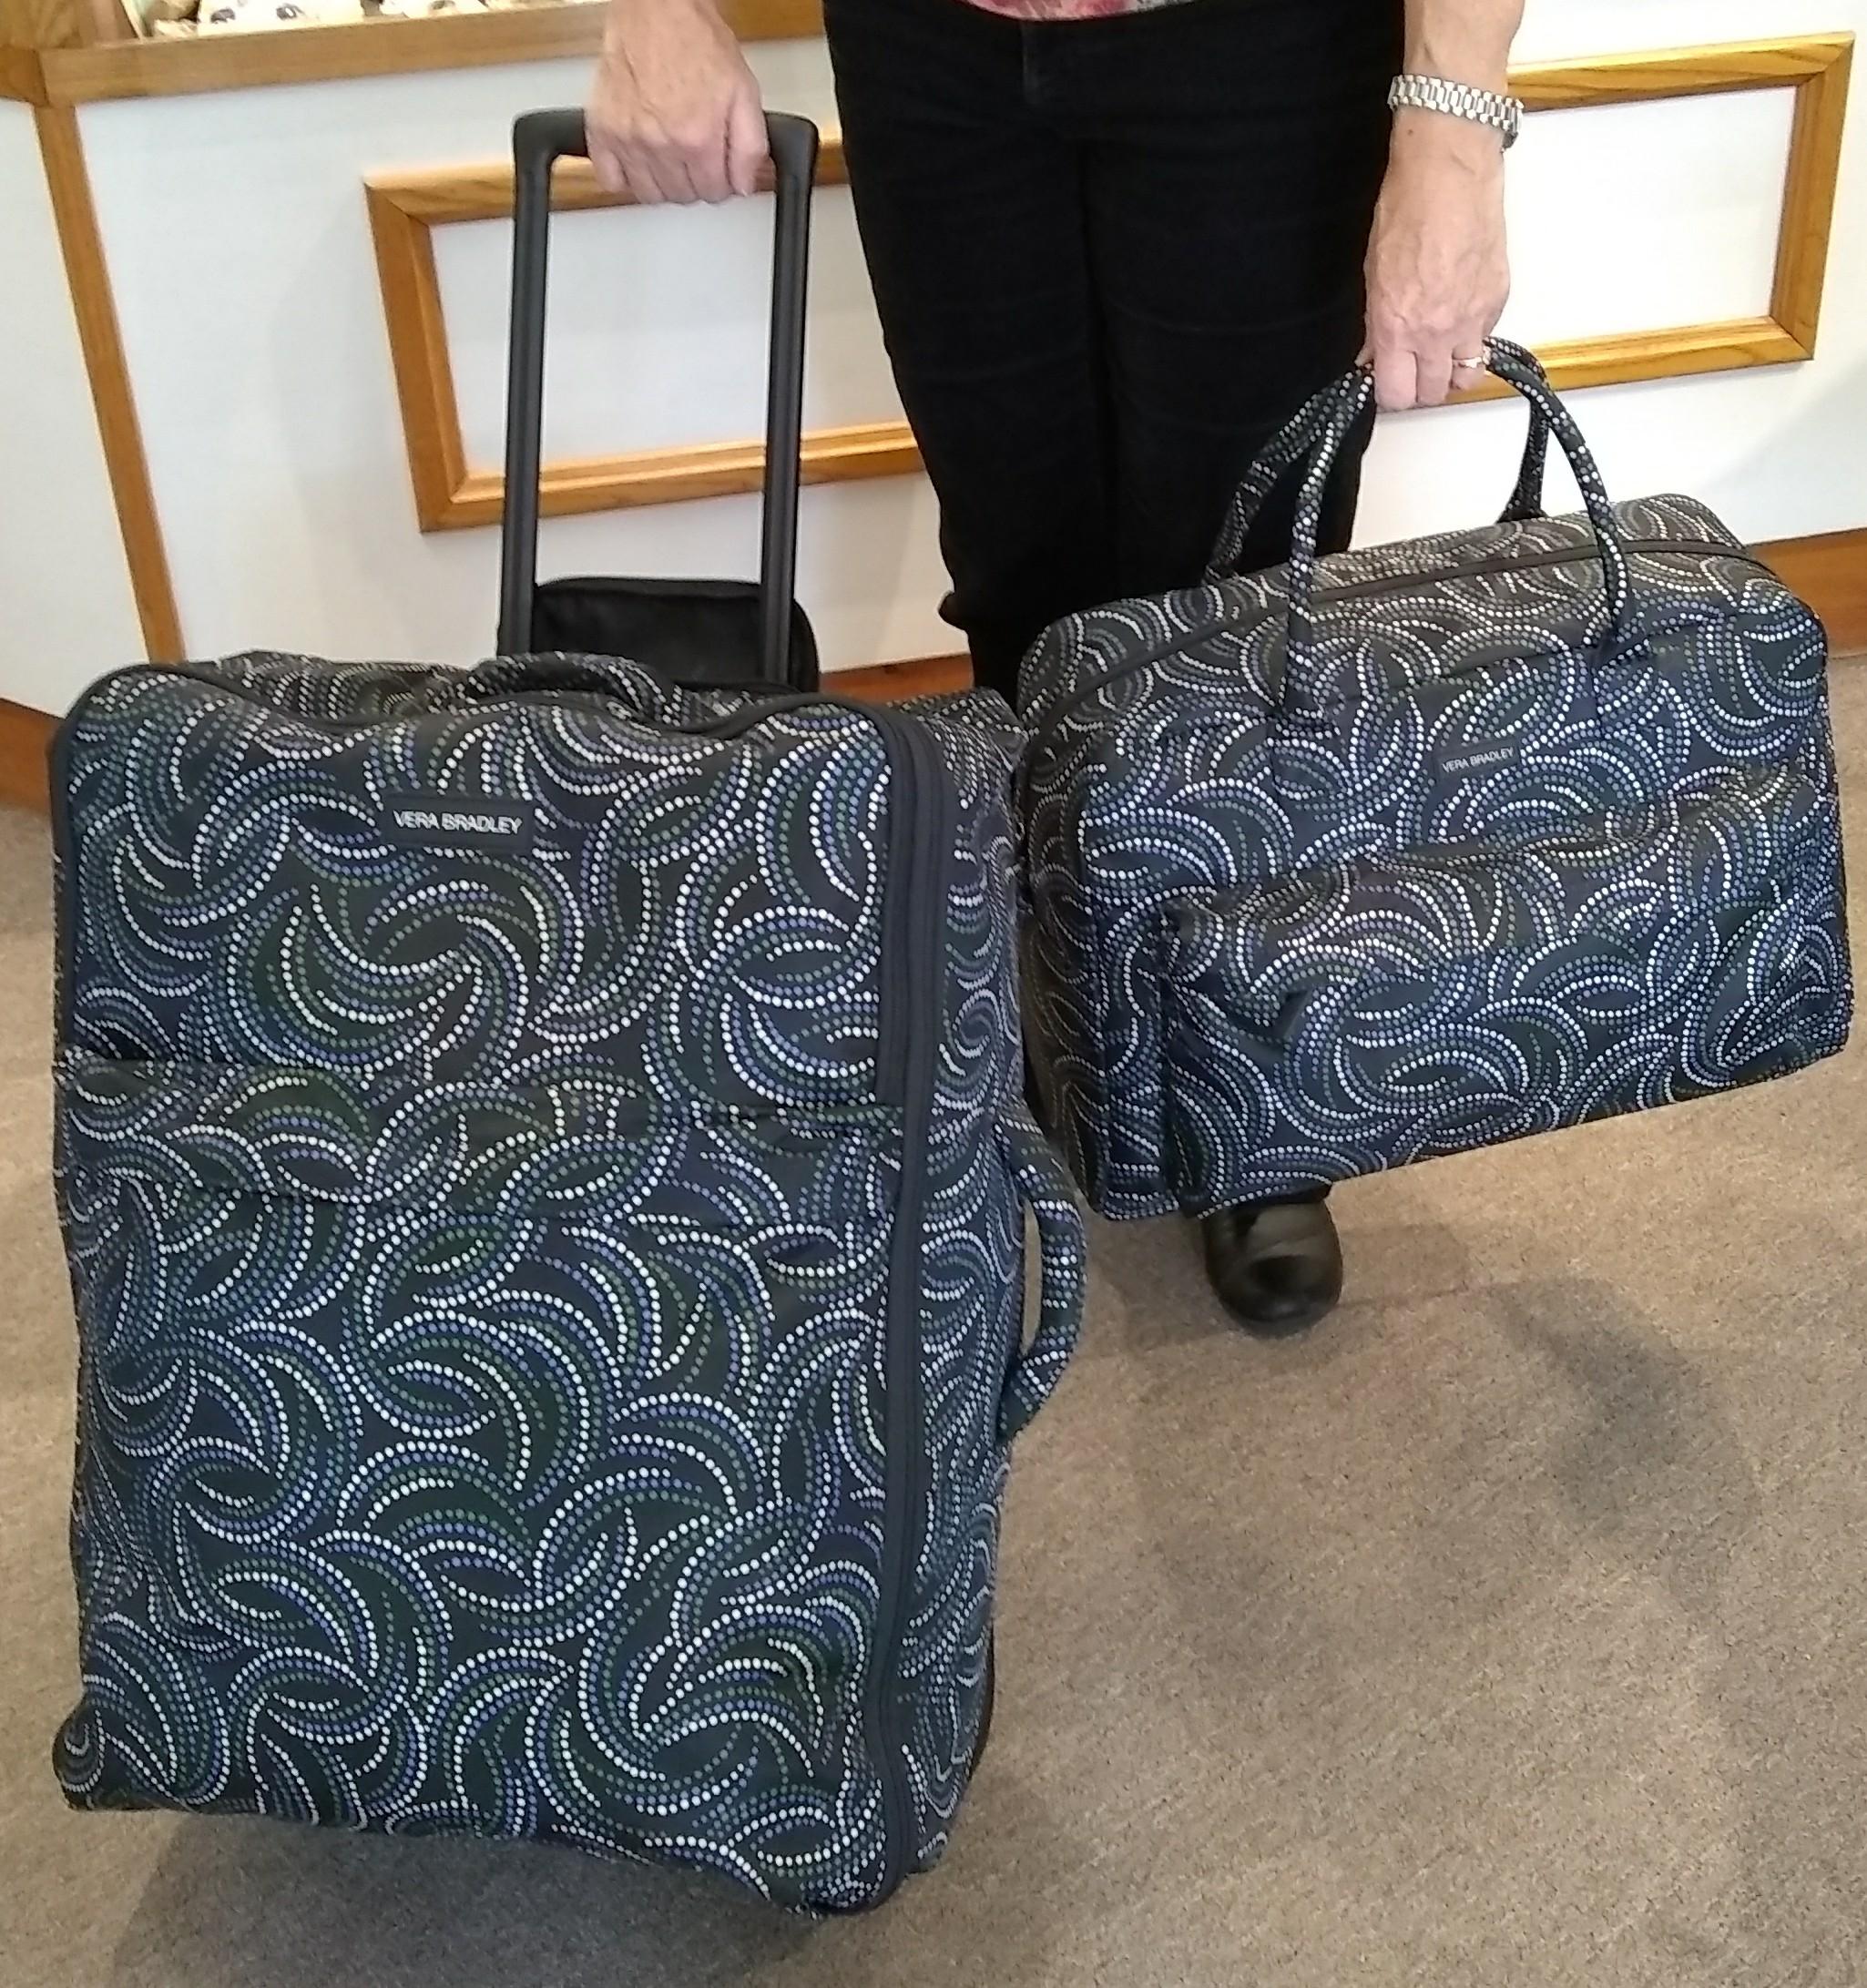 Vera Bradley Bag Raffle